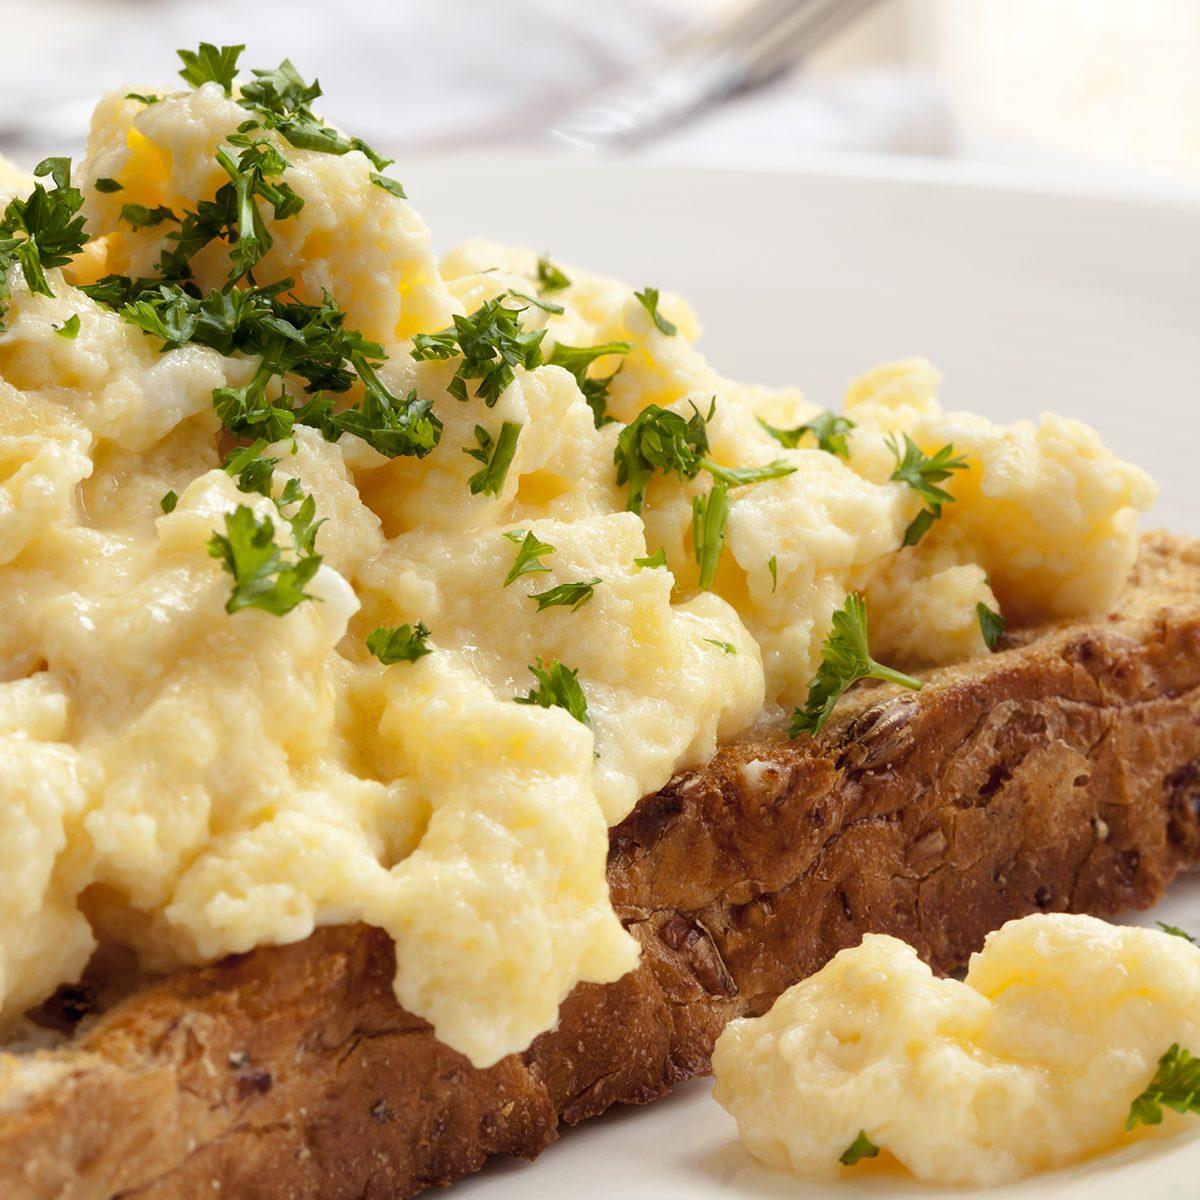 Scrambled eggs on toasted wholegrain bread.